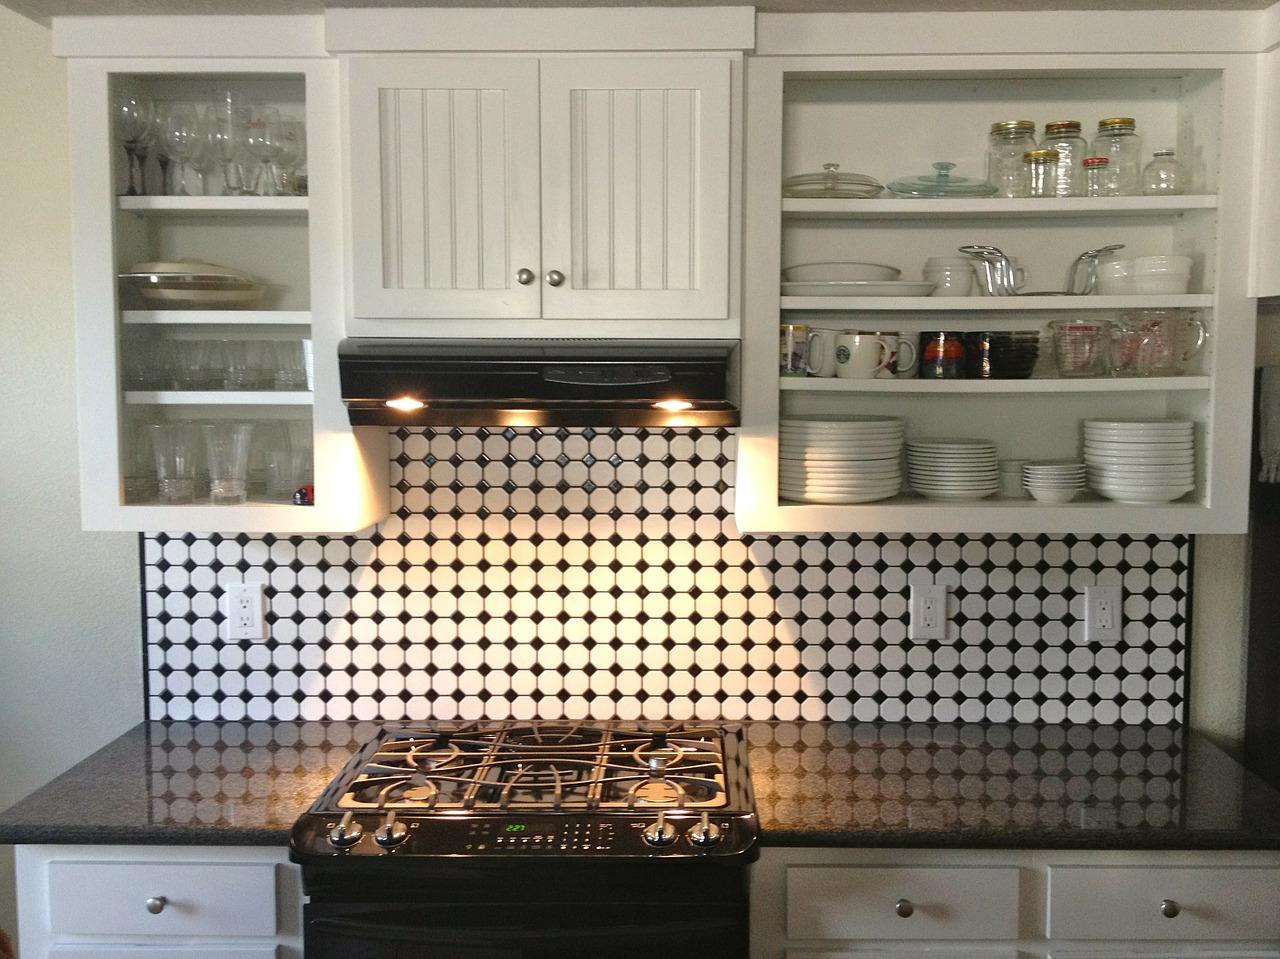 ginsburgconstruction-kitchen-3-330737_1280.jpg